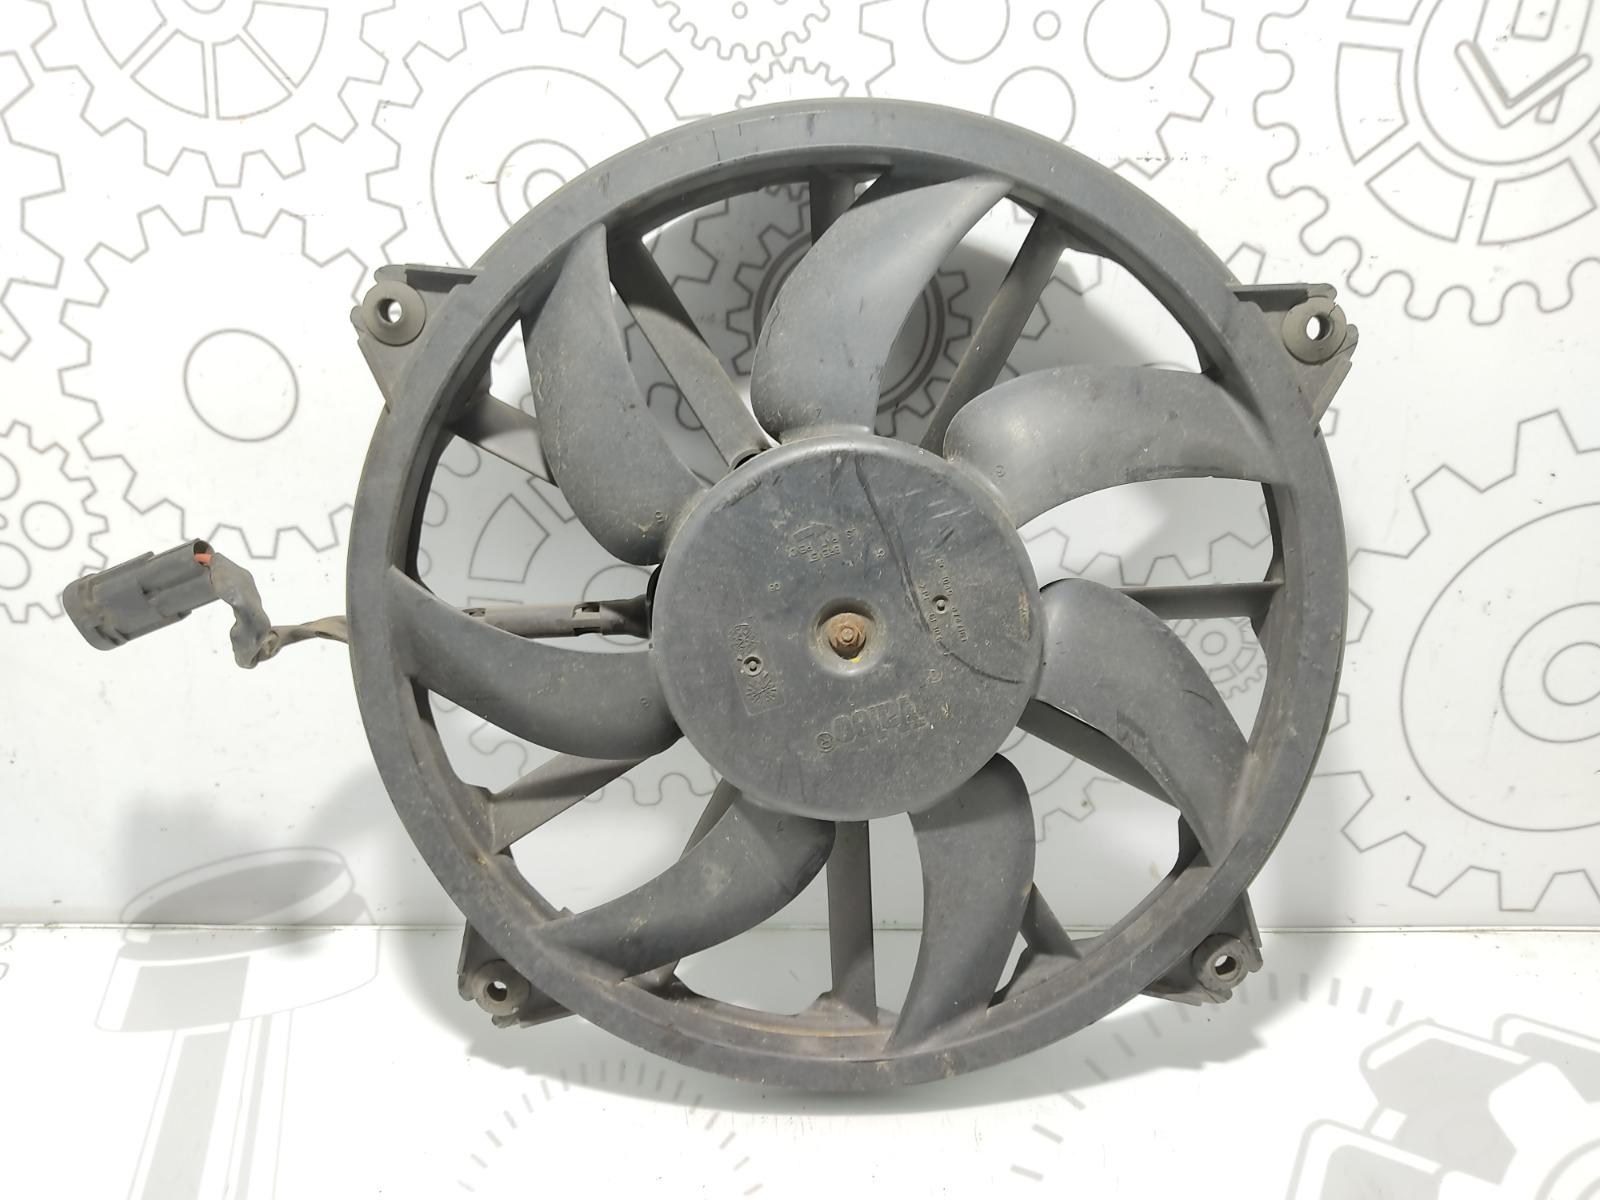 Вентилятор радиатора Peugeot 307 1.6 HDI 2007 (б/у)